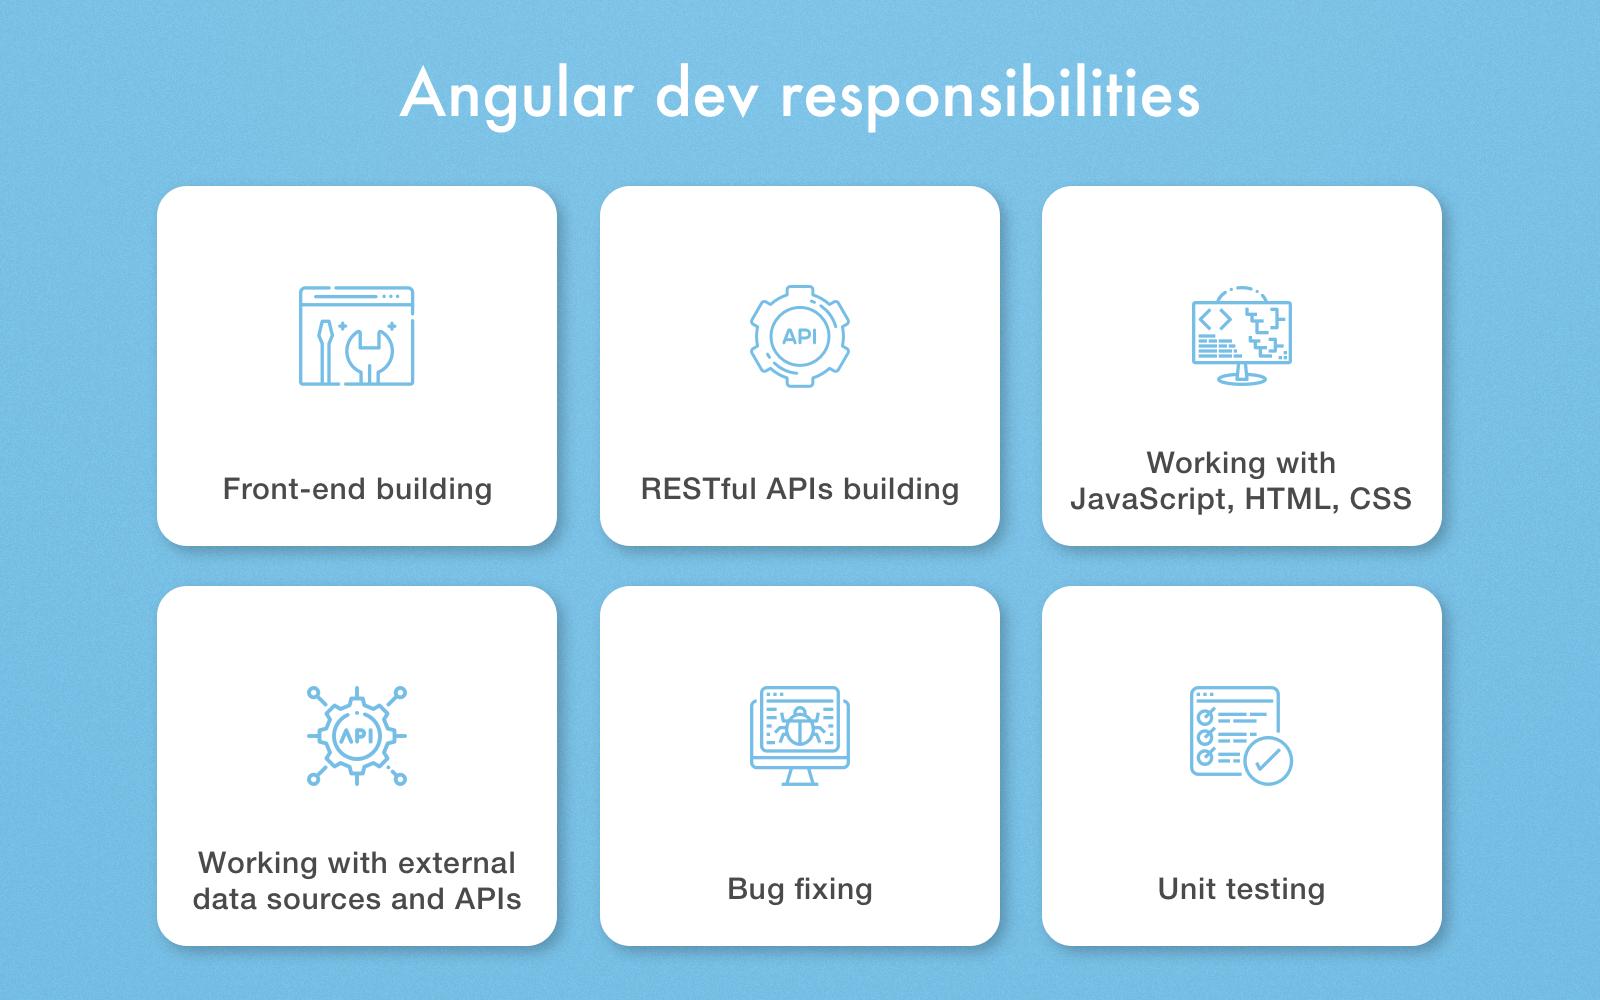 angularjs developer responsibilities